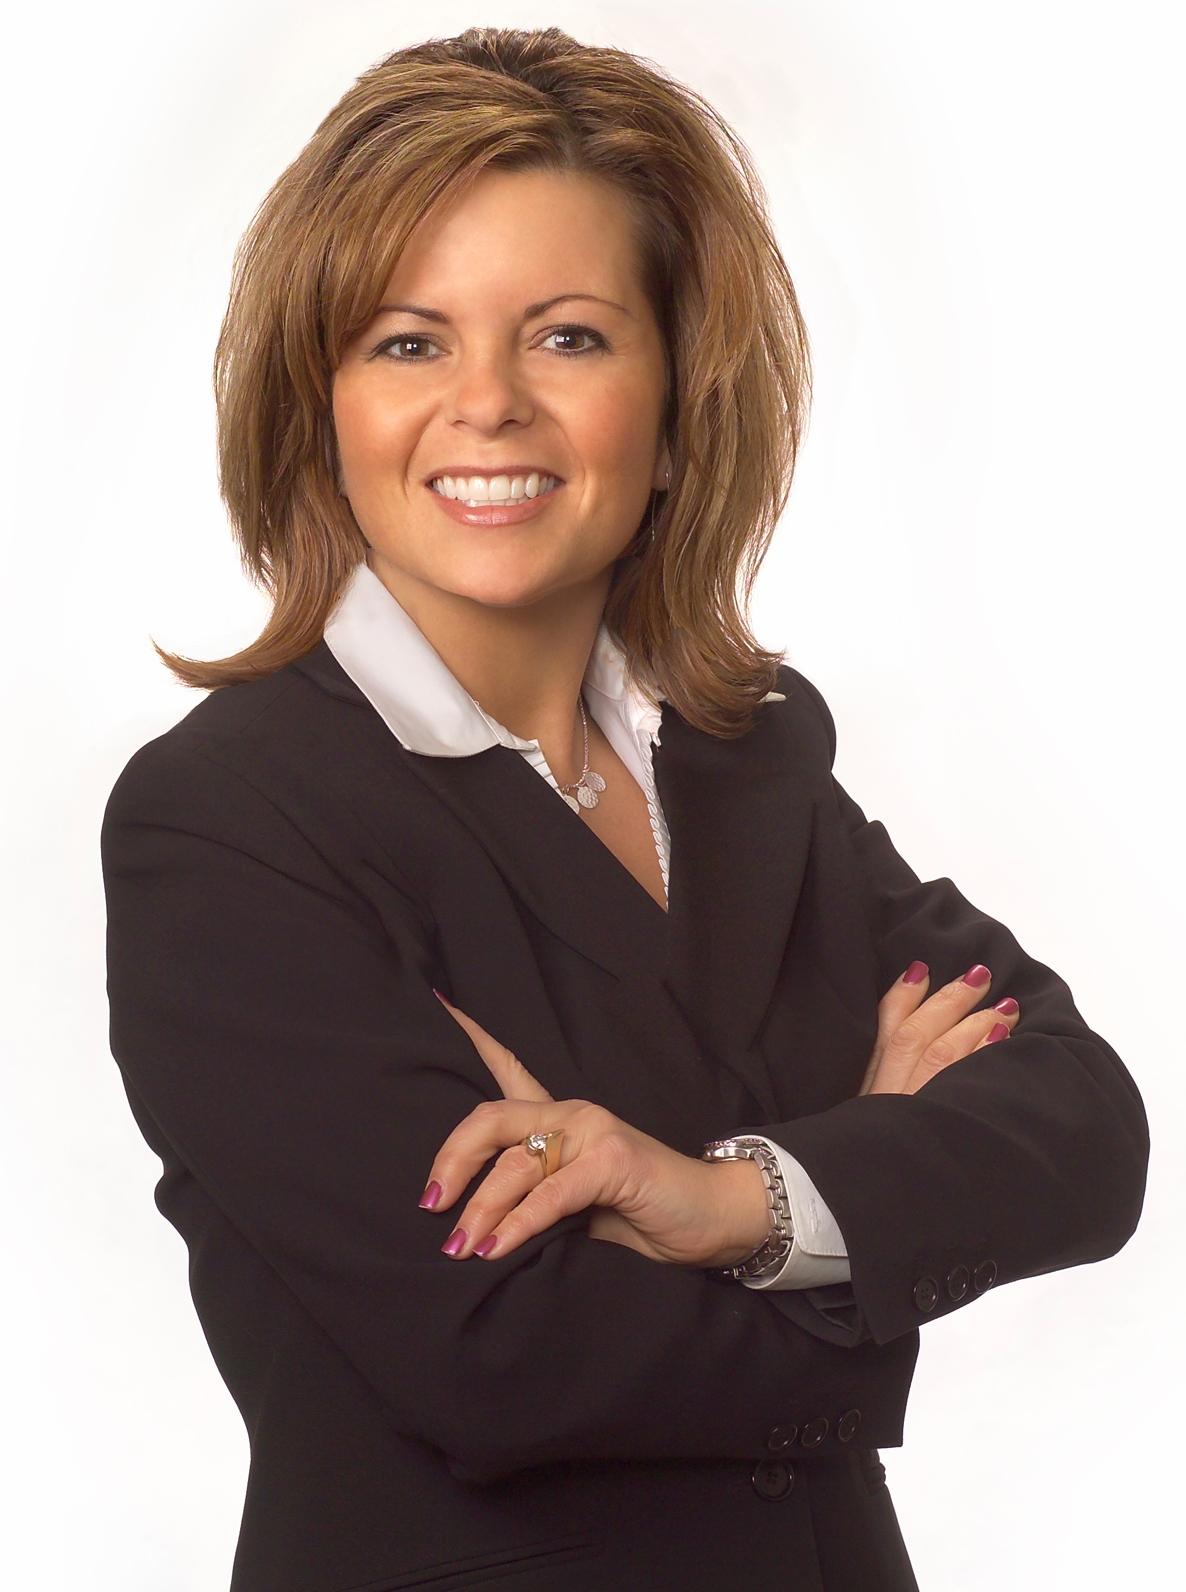 Julie M. Becker-Zabavski